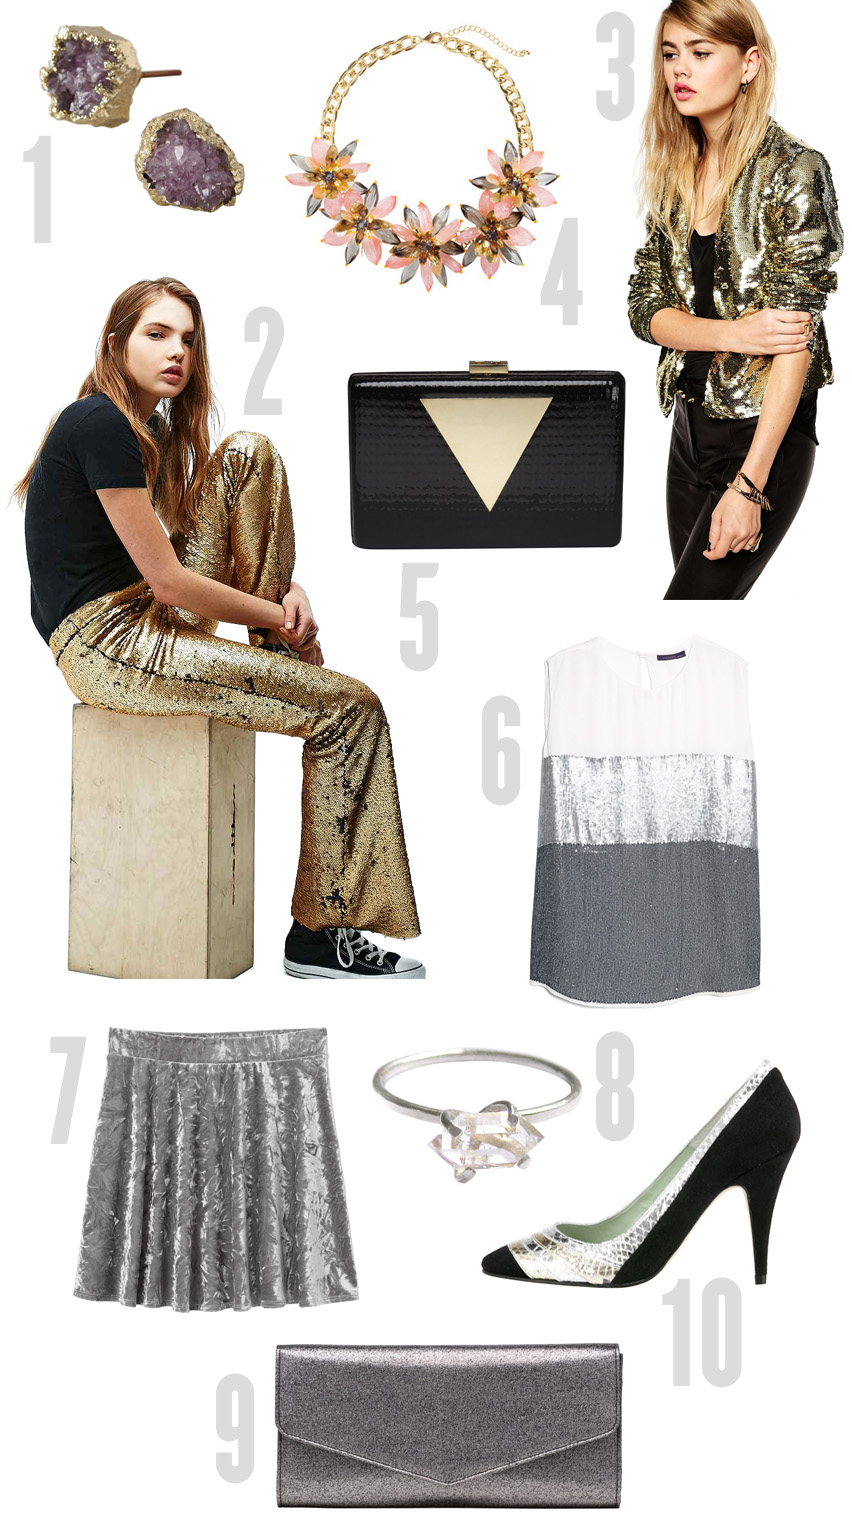 Vilda_oscars_collage